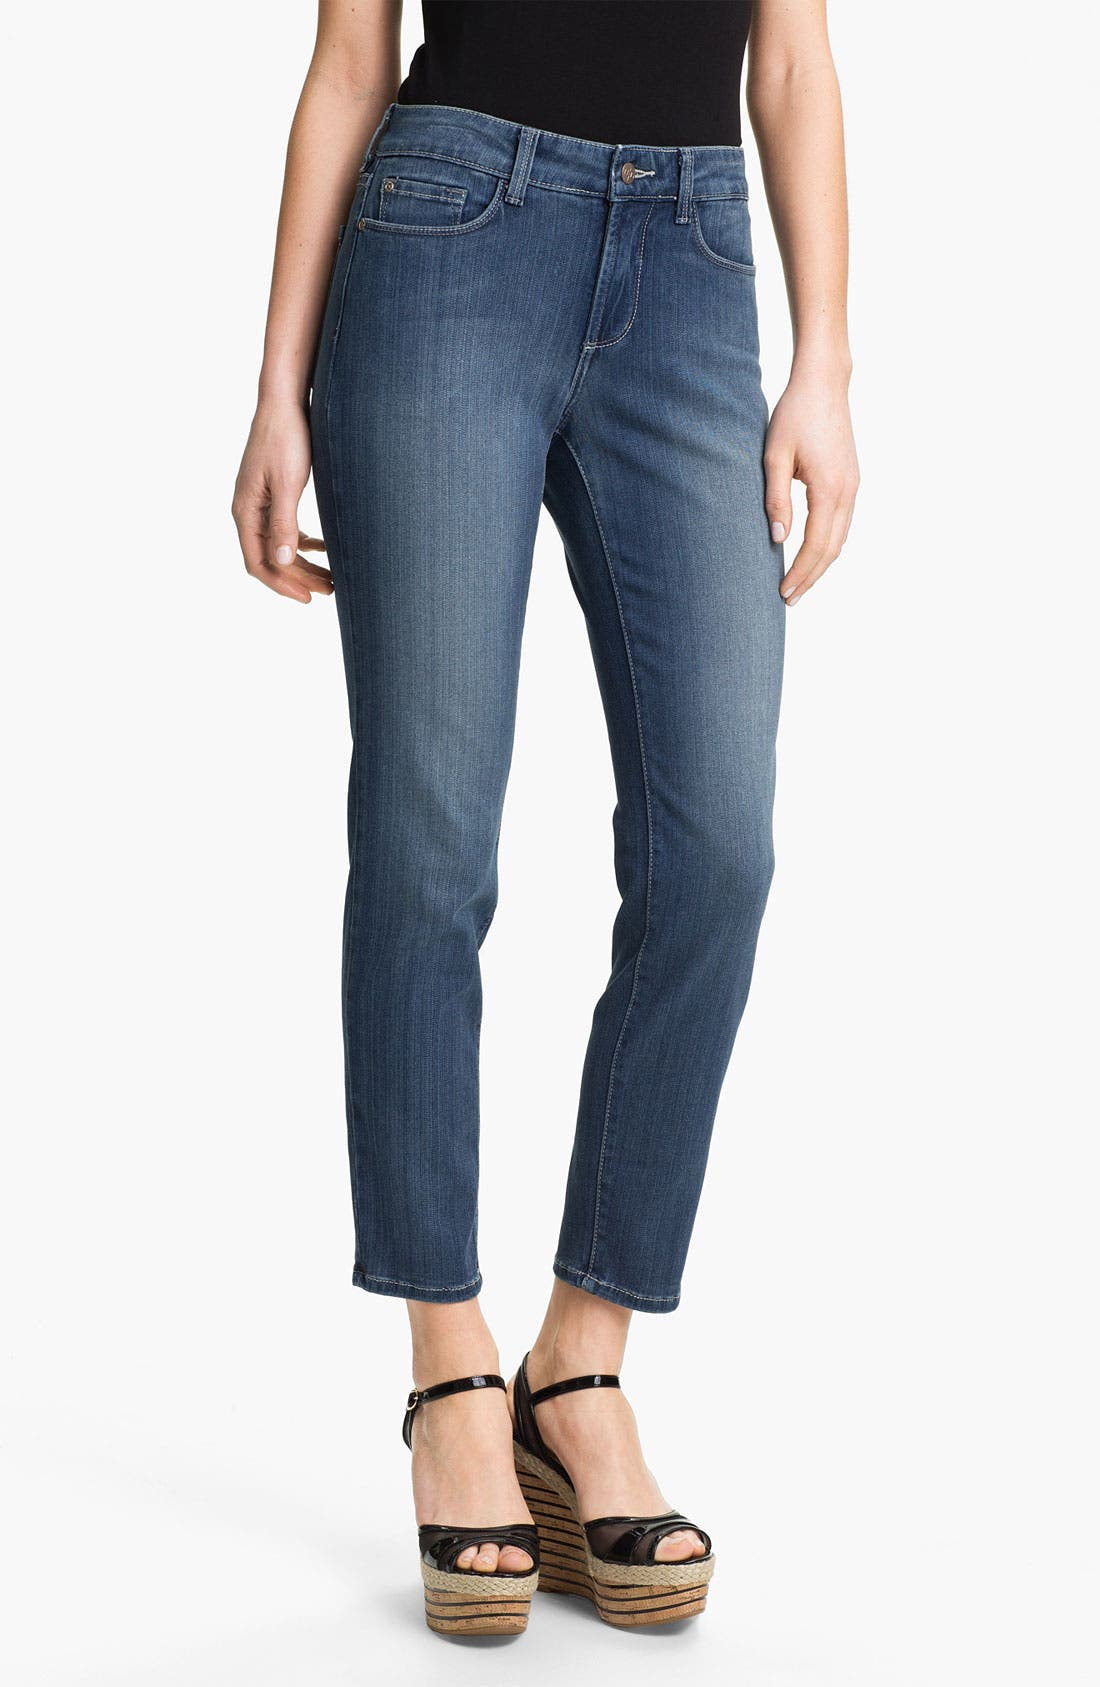 Alternate Image 1 Selected - NYDJ 'Alina' Stretch Skinny Jeans (Petite)